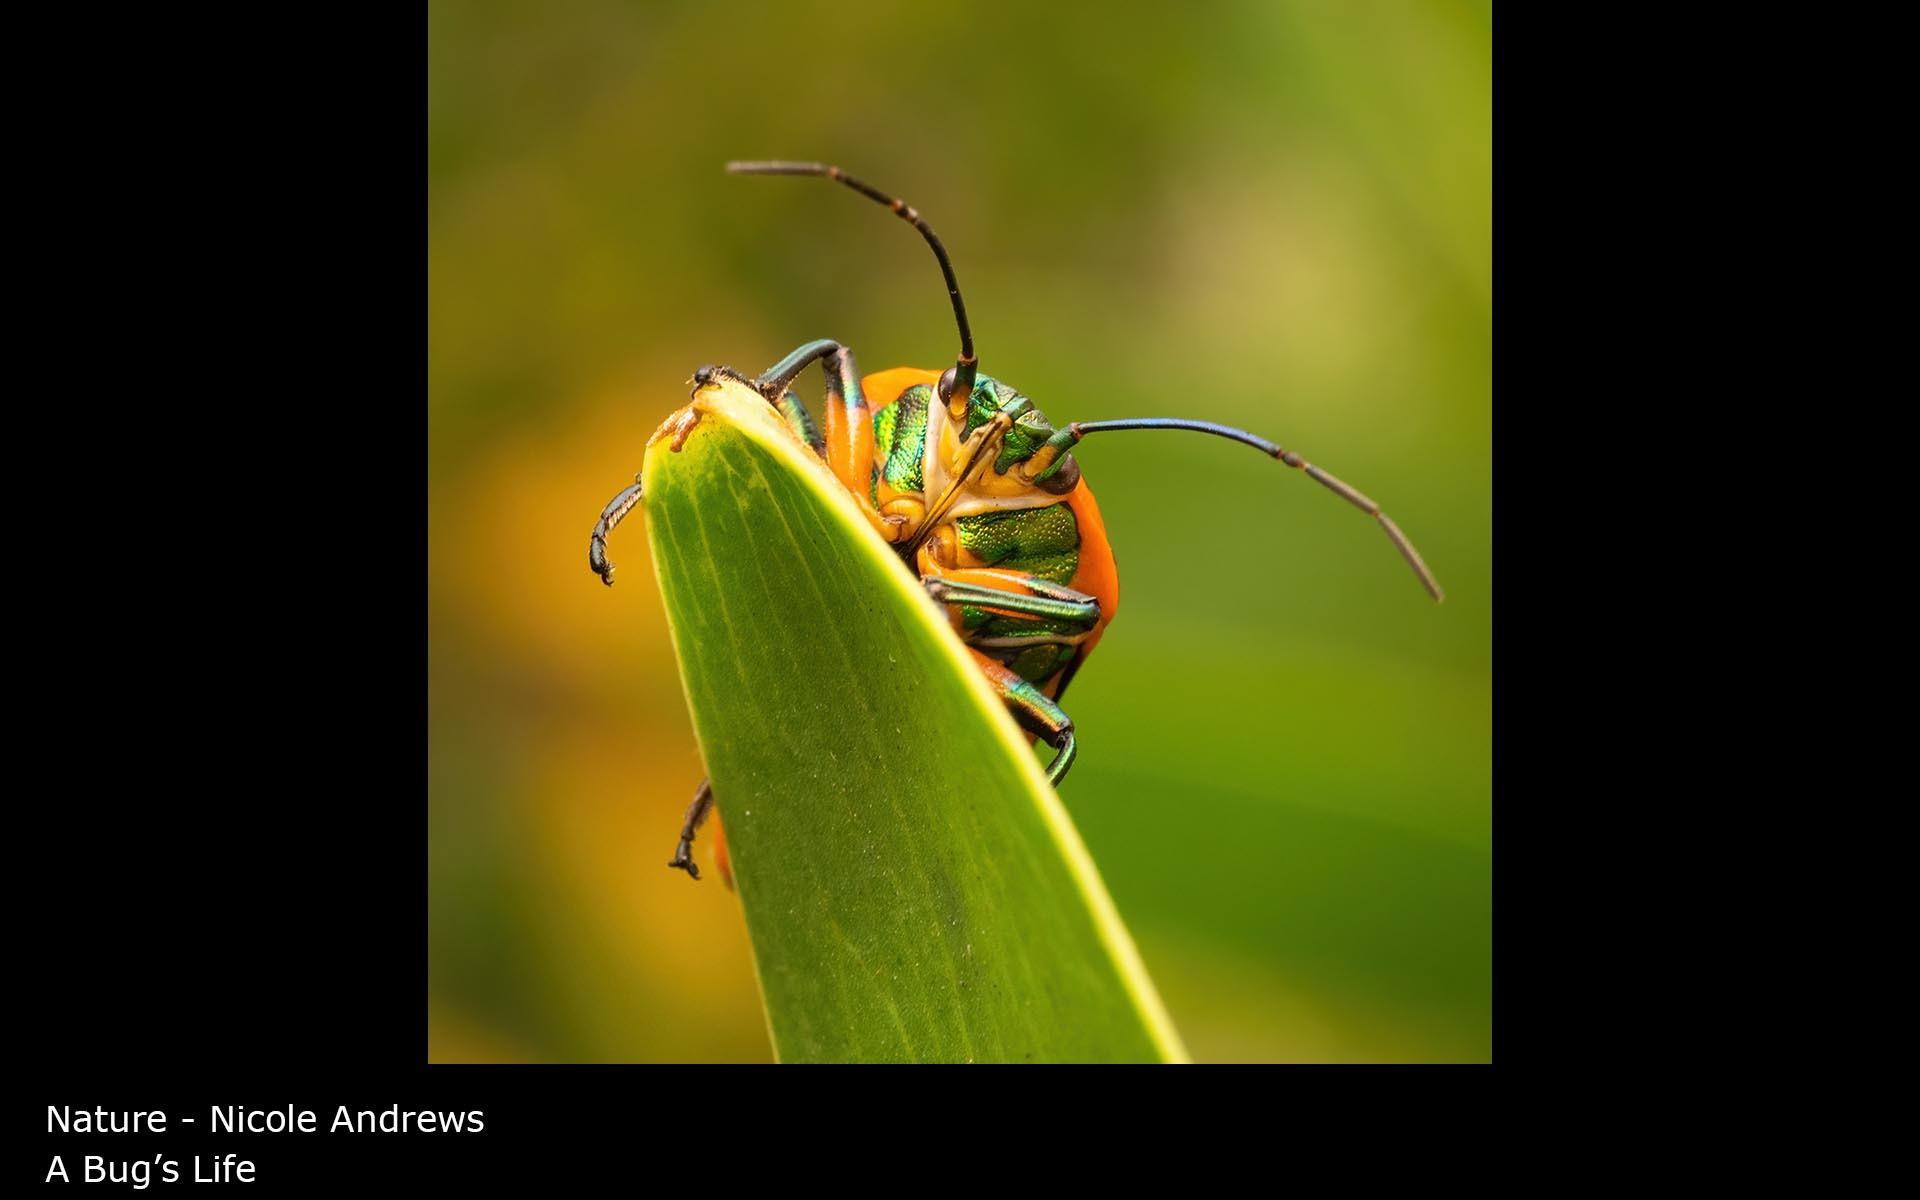 A Bug's Life - Nicole Andrews